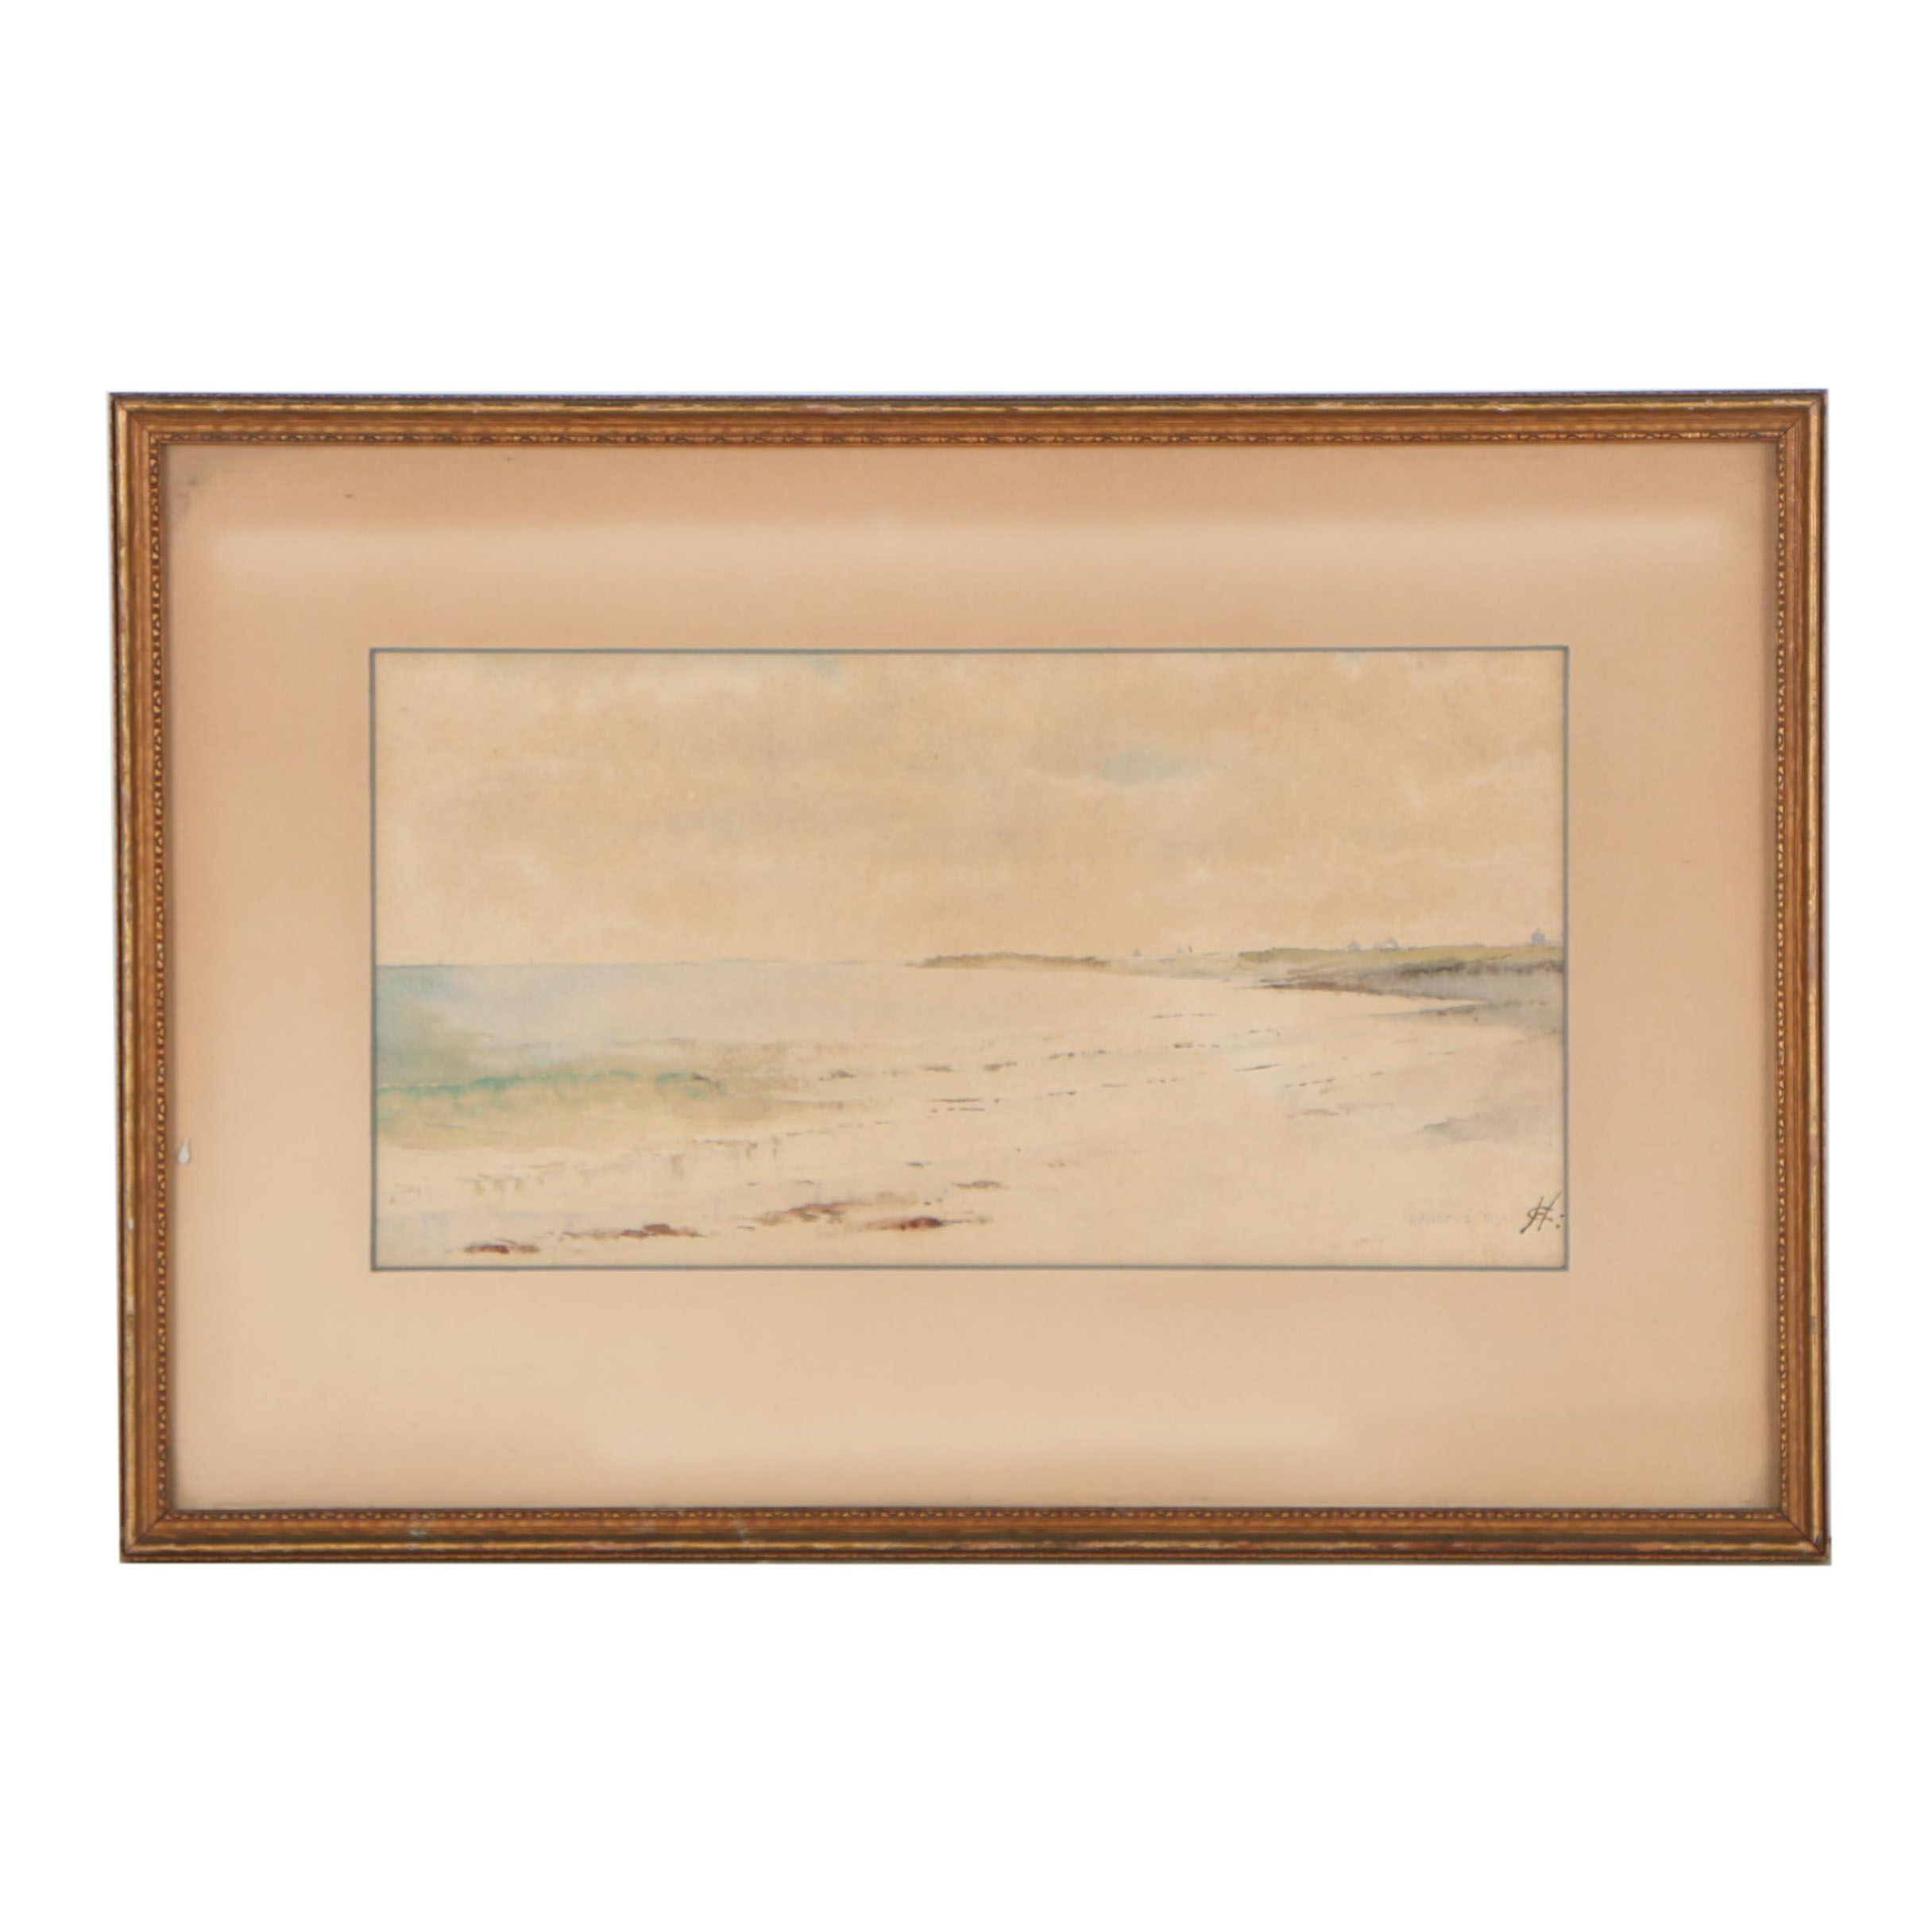 1891 Watercolor Painting of Coastal Scene